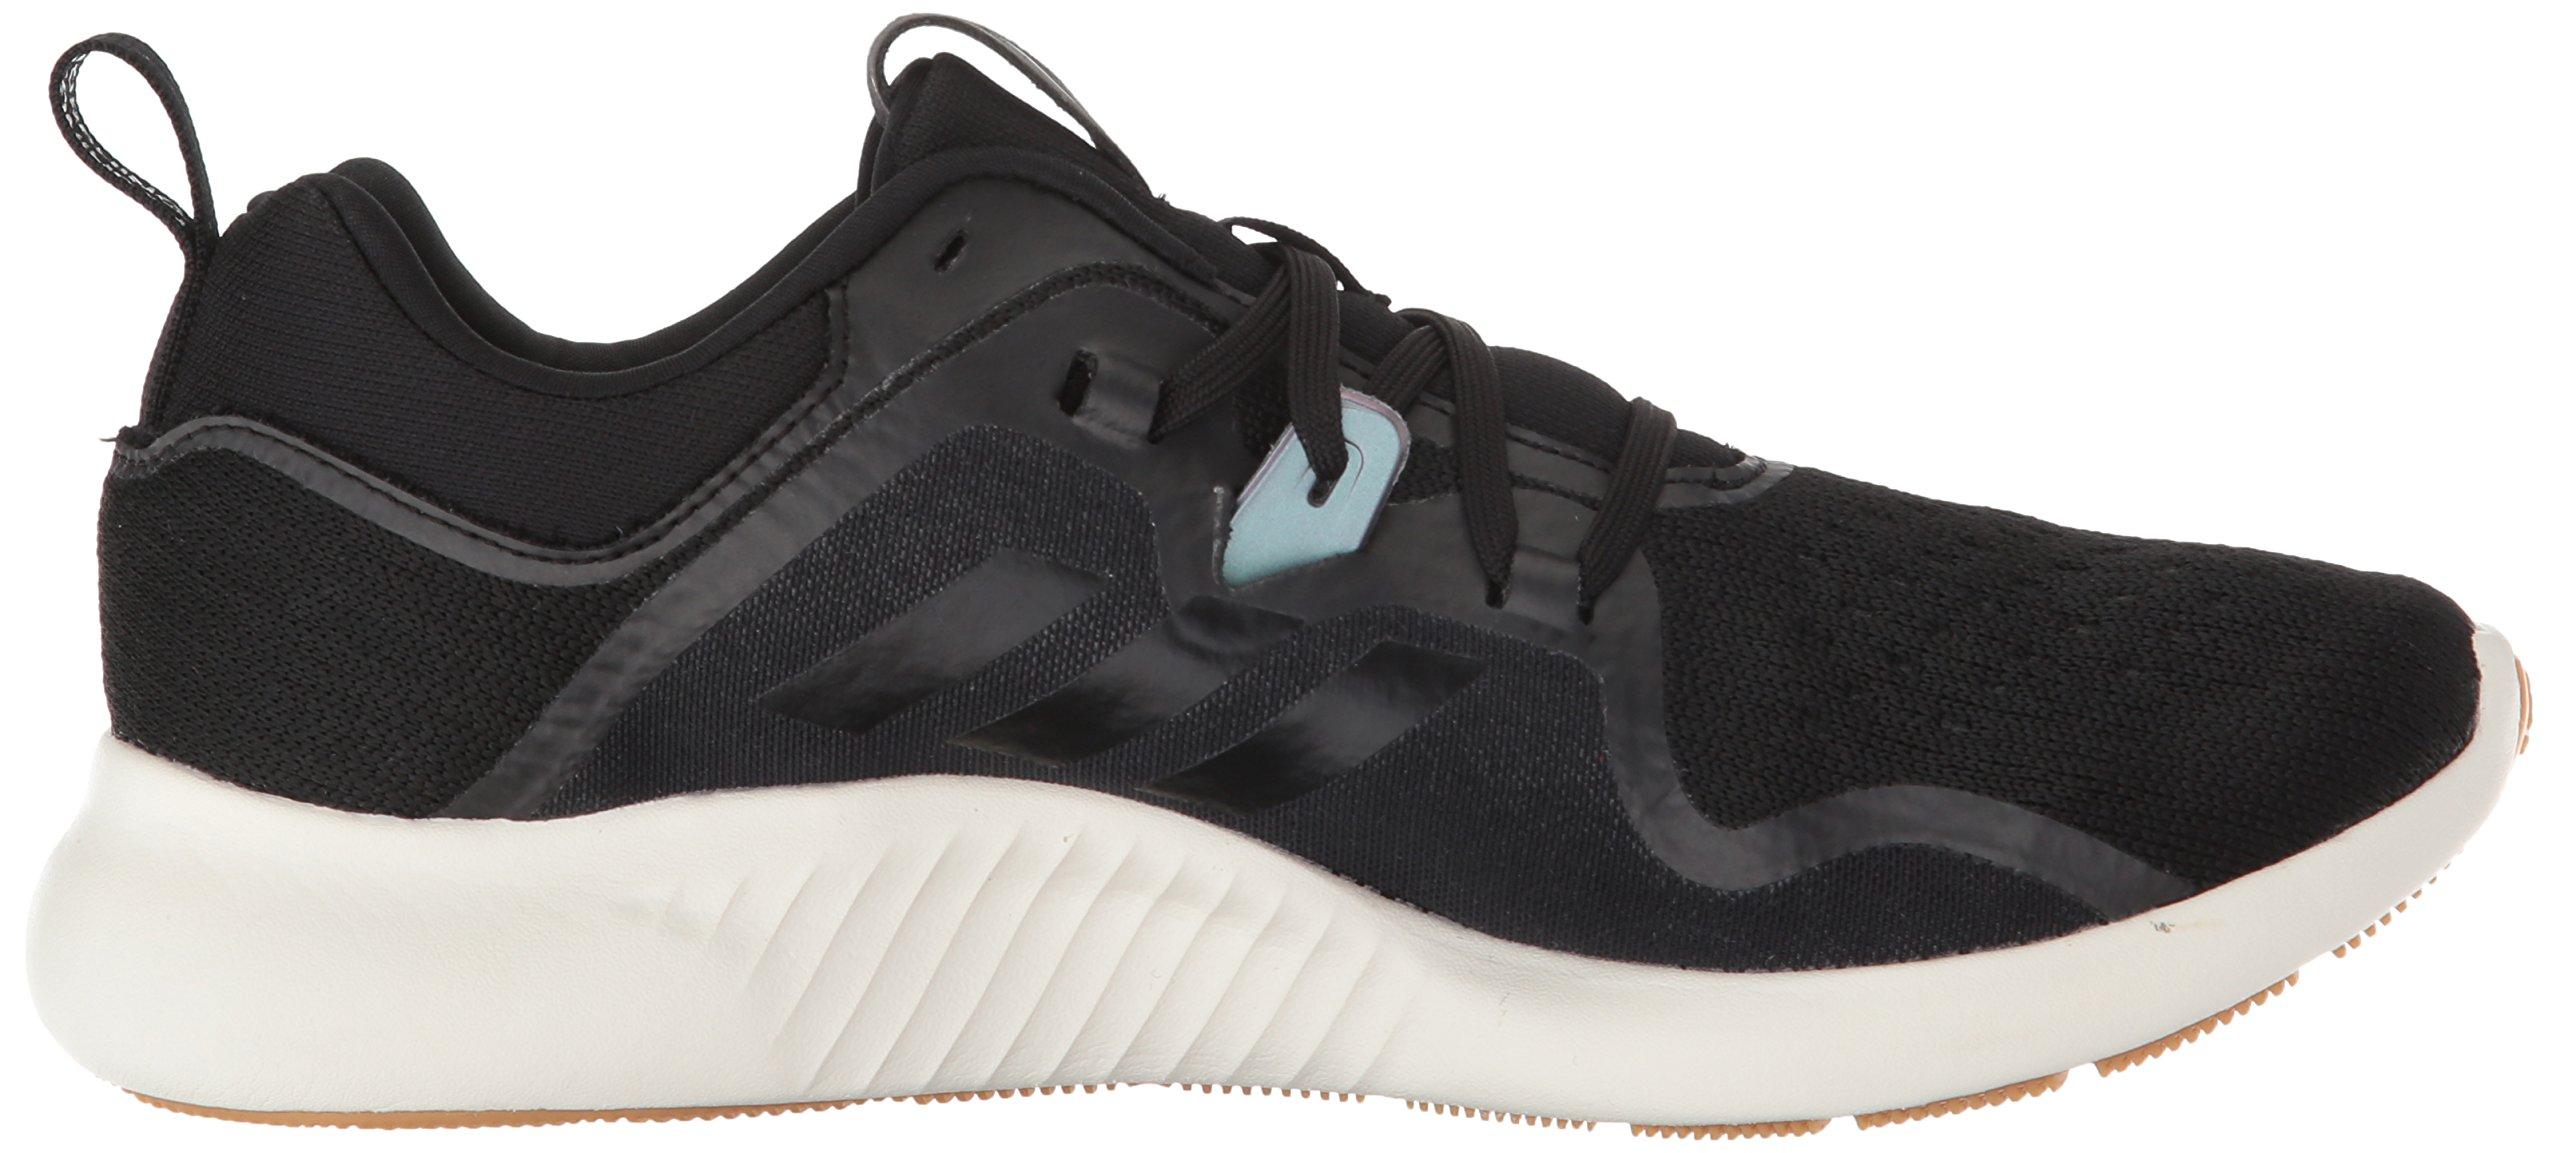 adidas Women's Edgebounce Running Shoe Black/Night Metallic, 5.5 M US by adidas (Image #6)